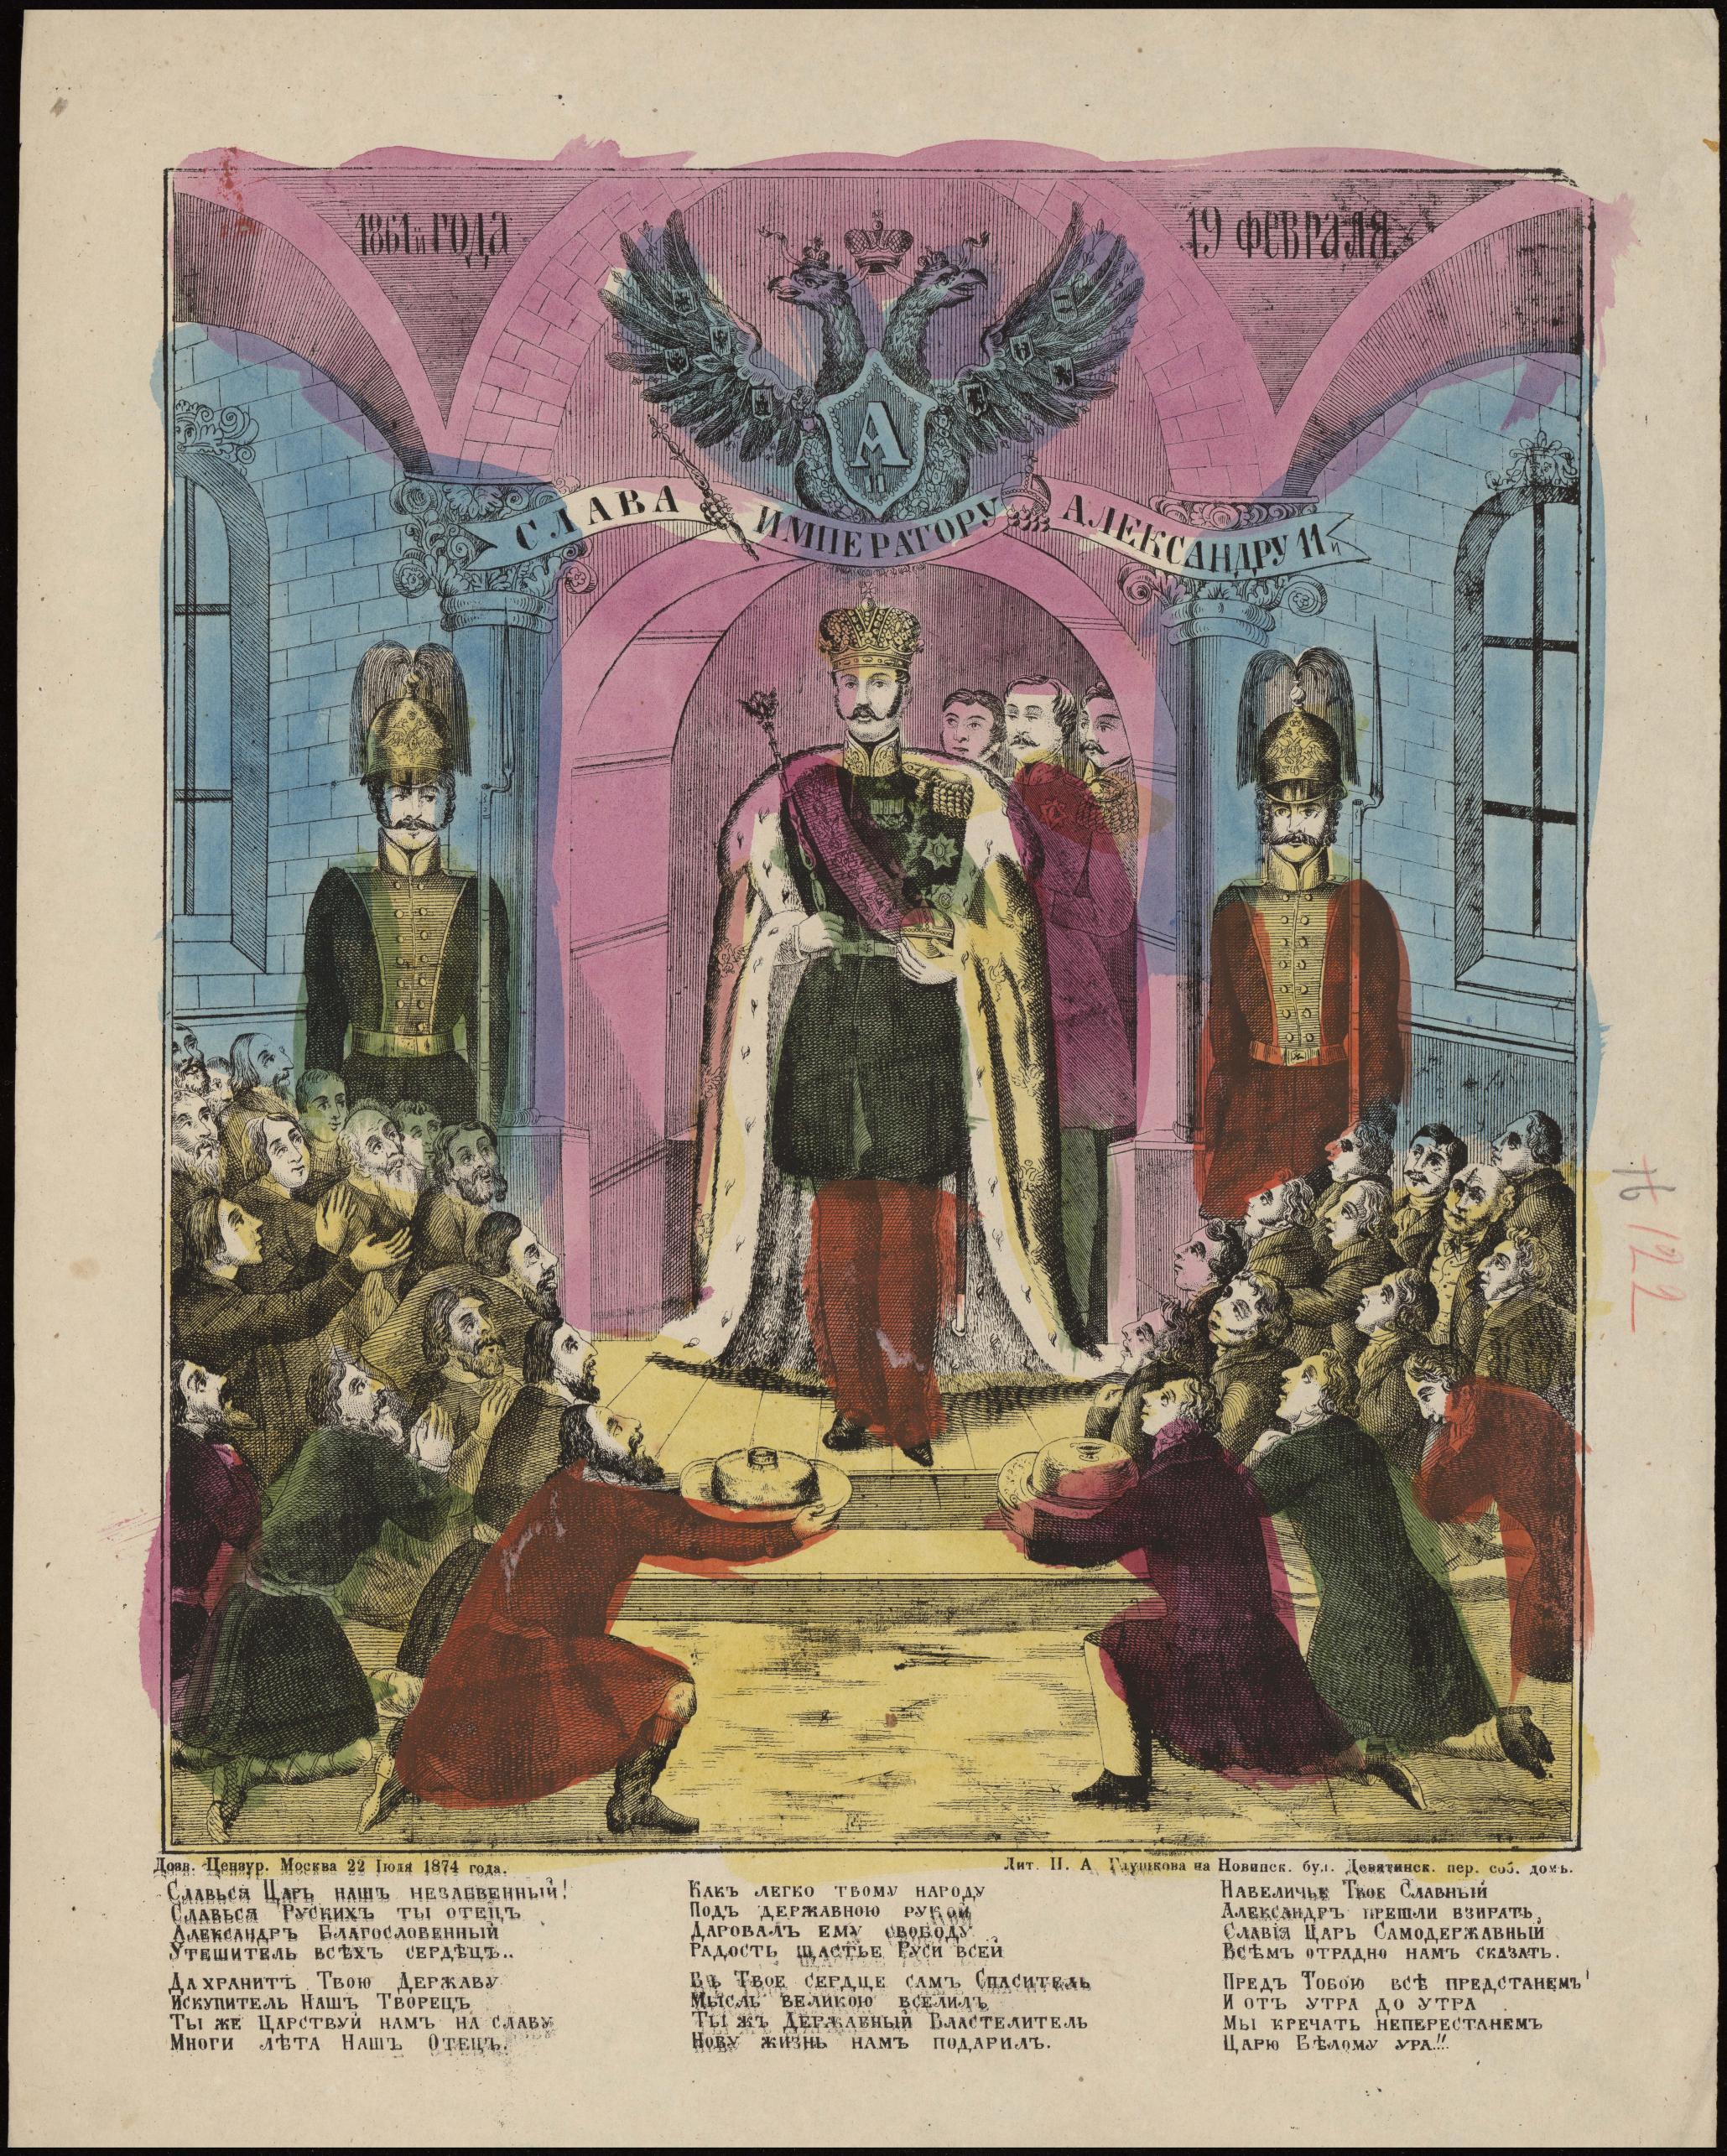 1874. Слава Императору Александру II Москва Лит. П.А. Глушкова